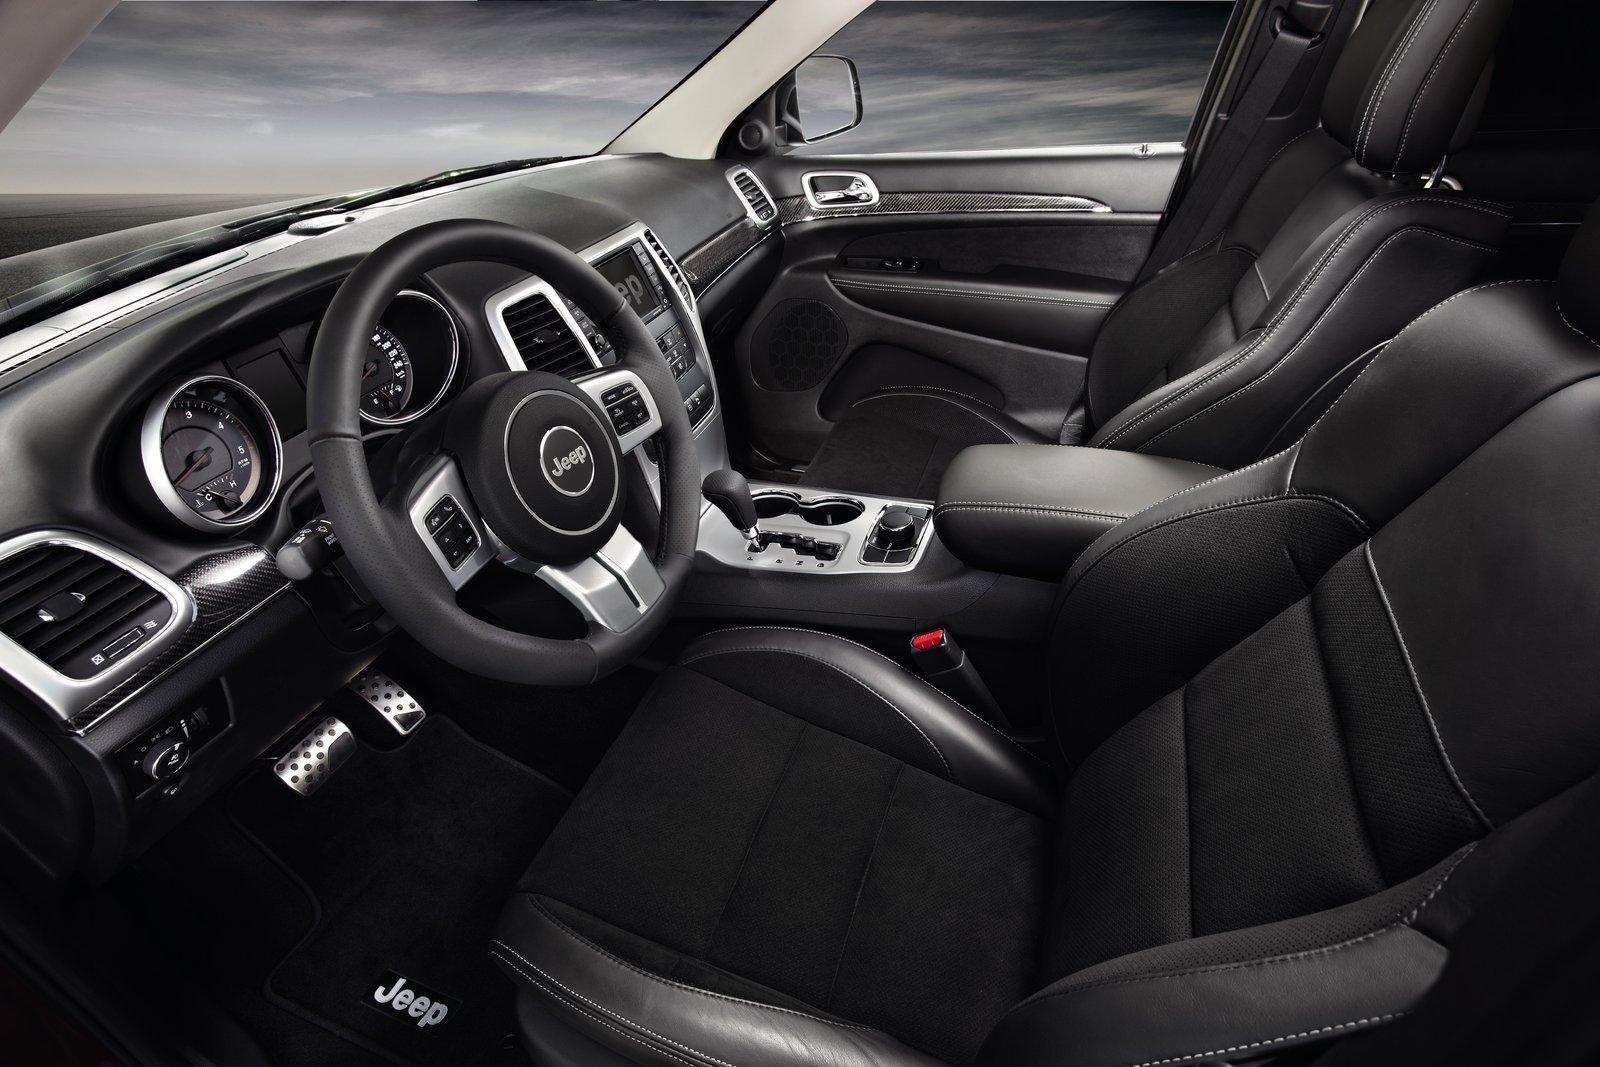 http://images.caradisiac.com/images/6/5/0/2/76502/S0-Un-Jeep-Grand-Cherokee-Sports-Concept-au-Salon-de-Geneve-254828.jpg